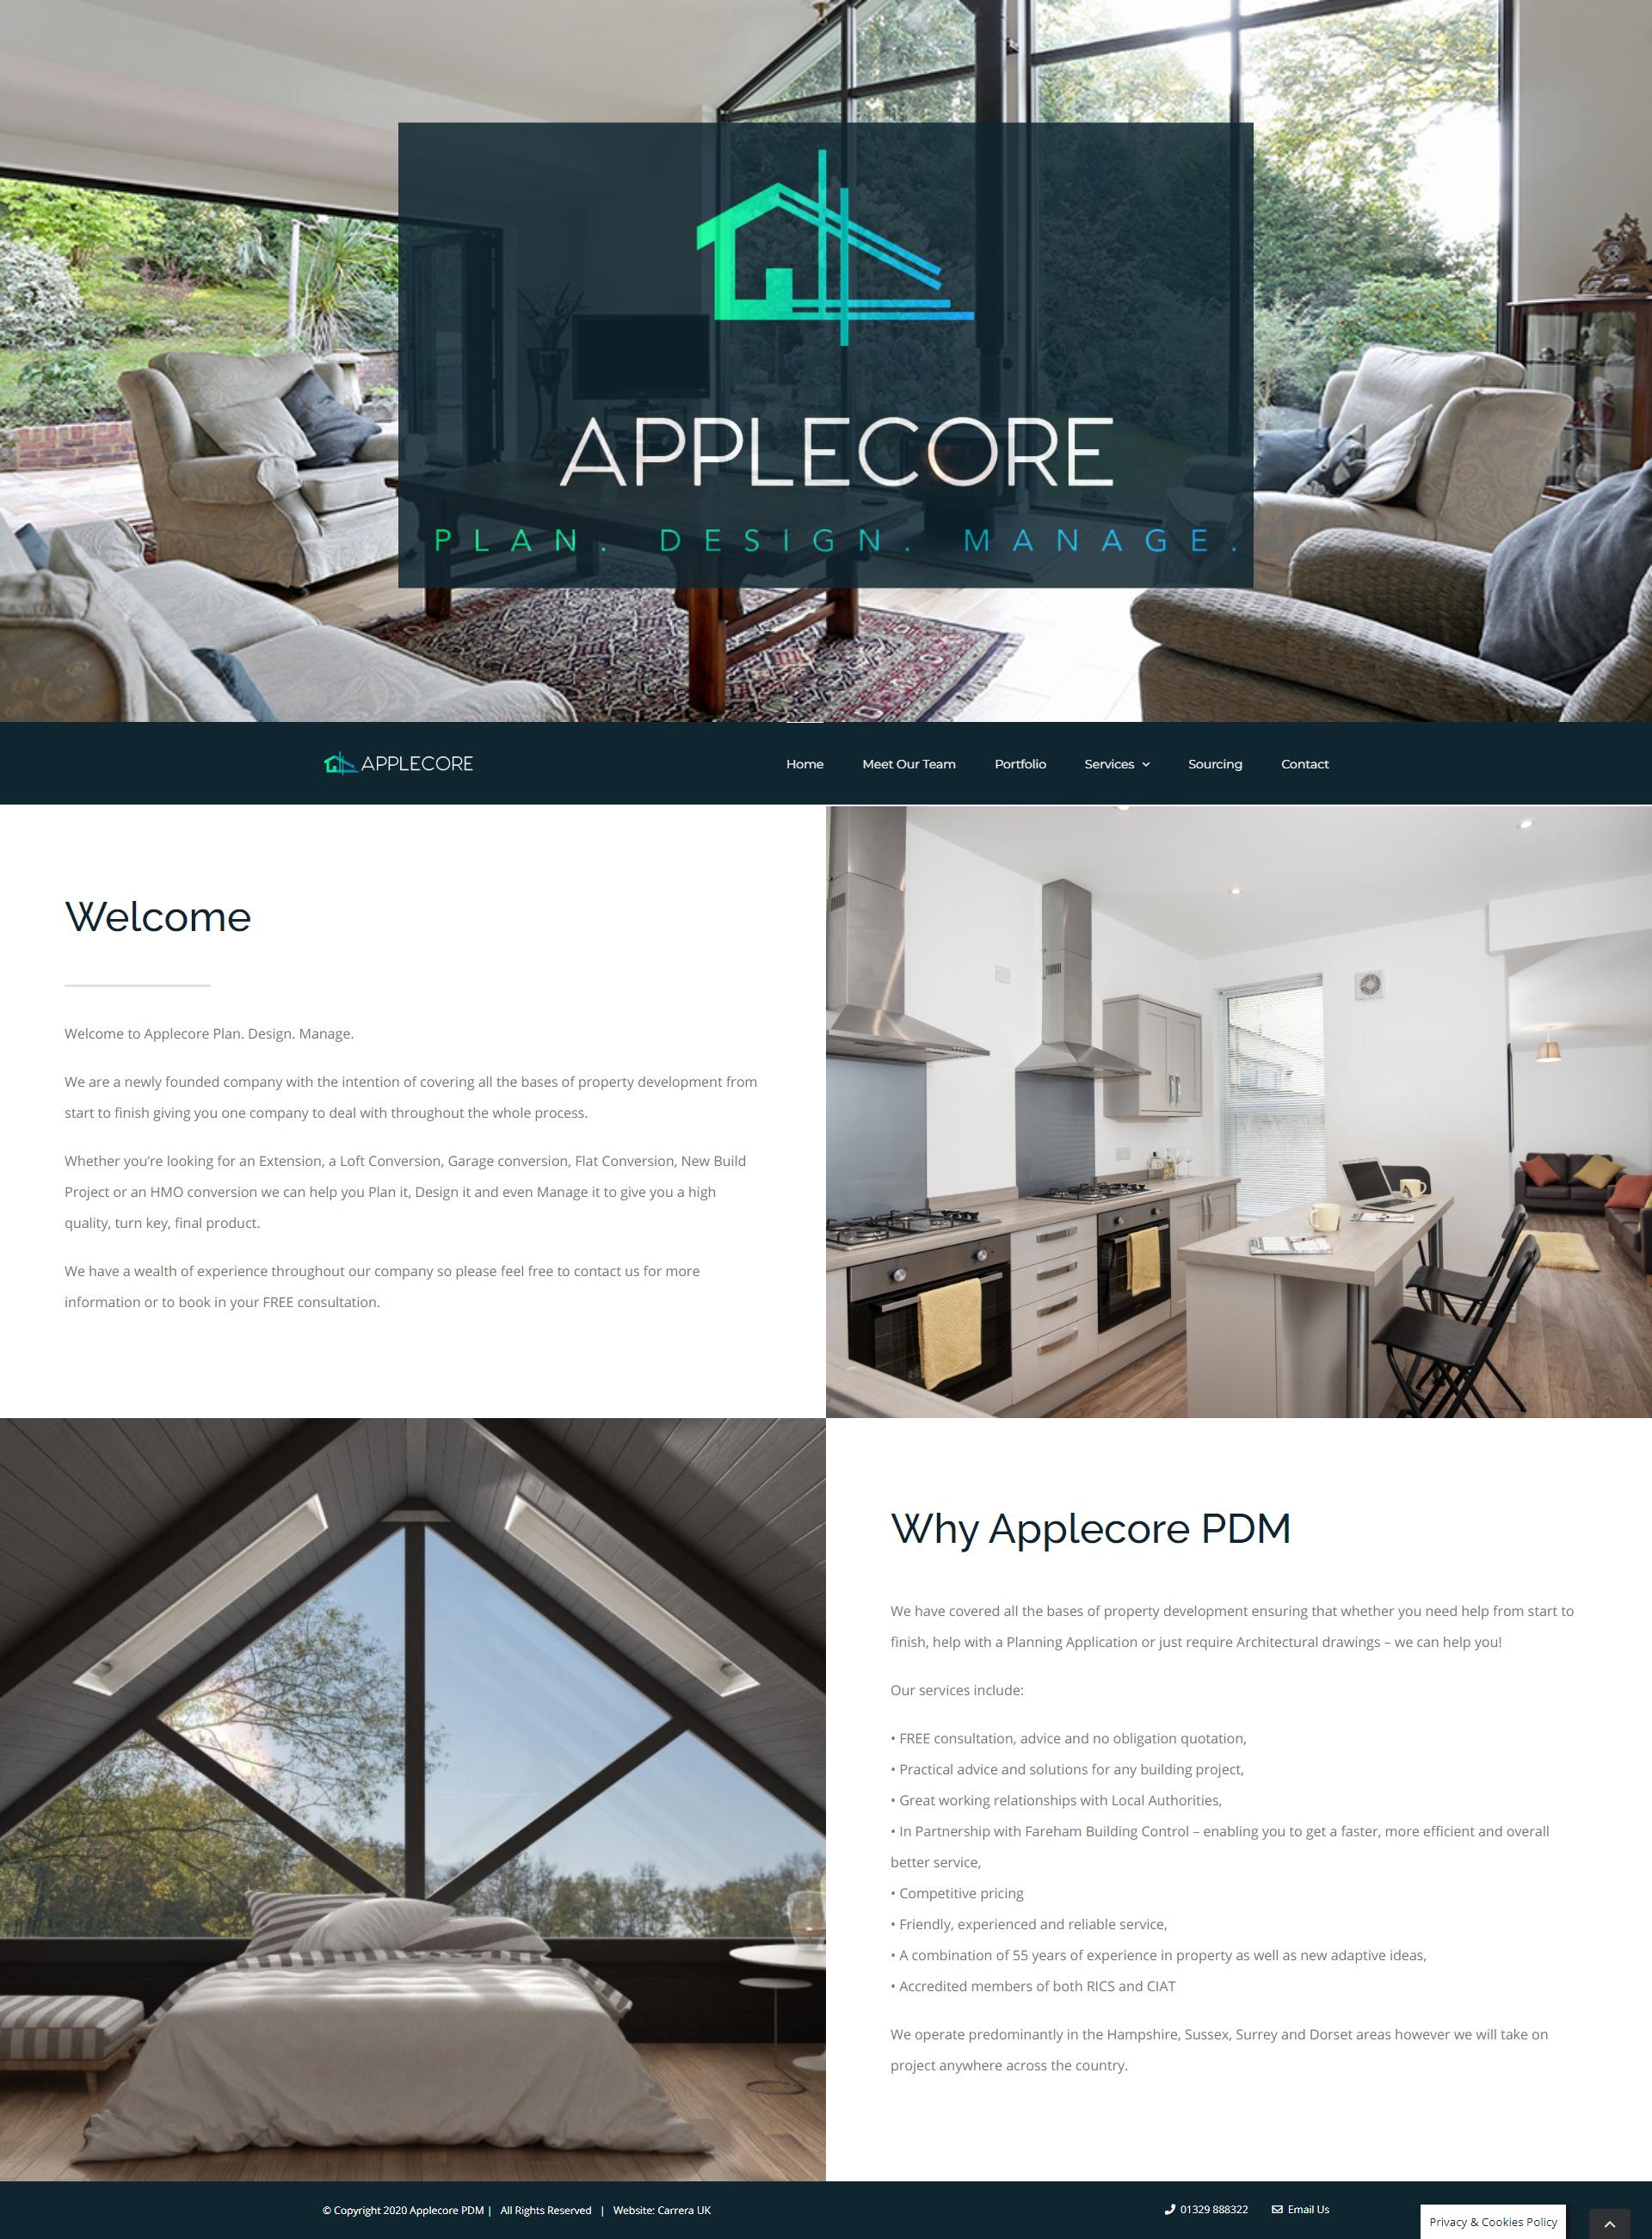 Applecore PDM Website Designed by Carrera UK